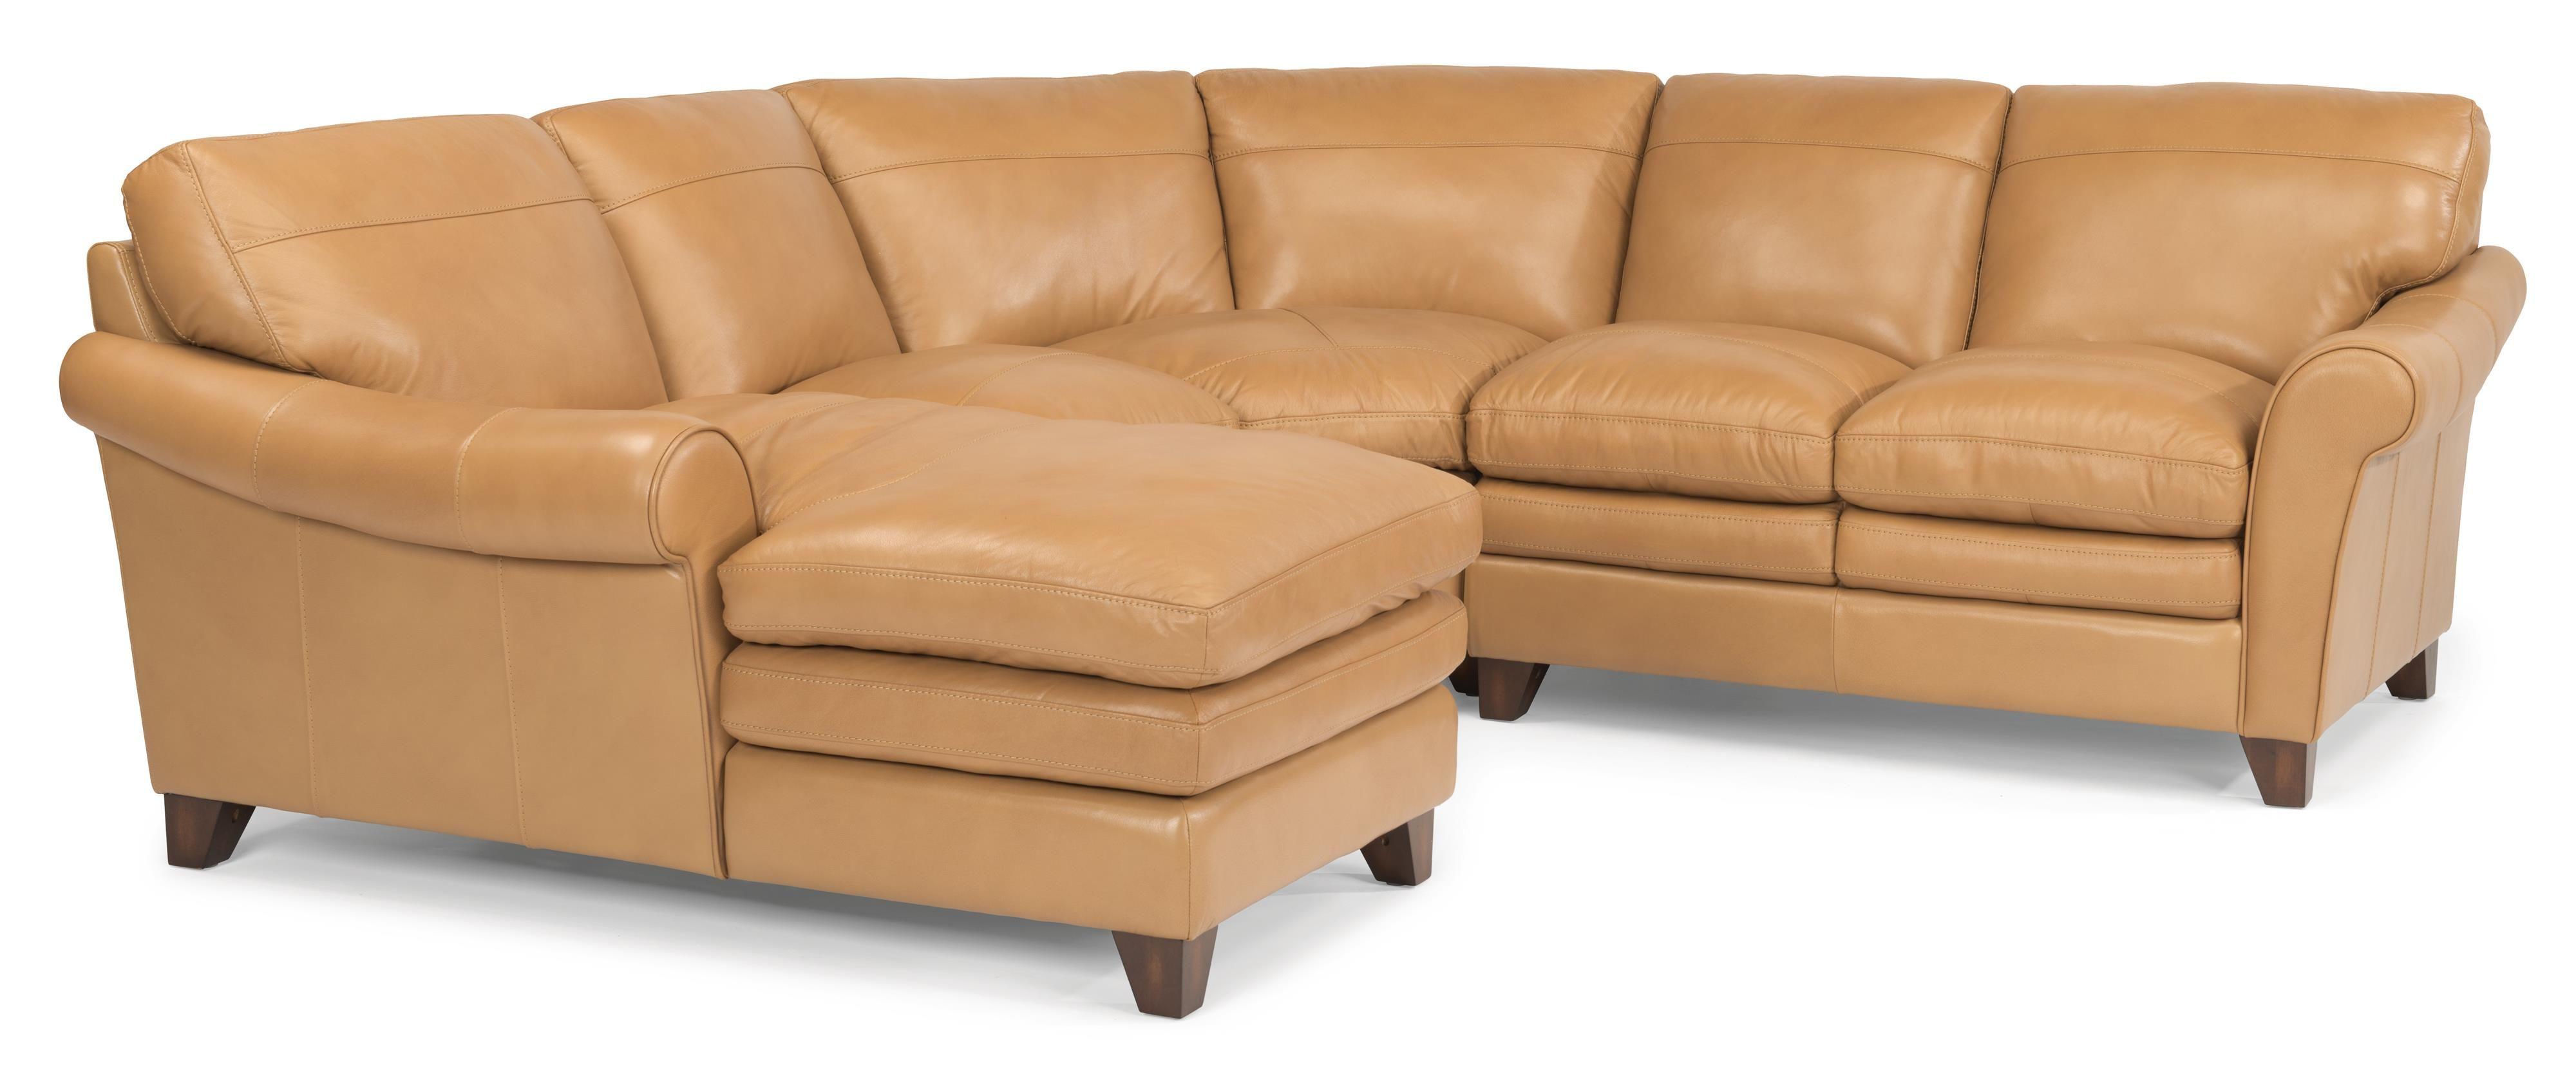 Latitudes Sofia 4 Pc Sectional Sofa by Flexsteel